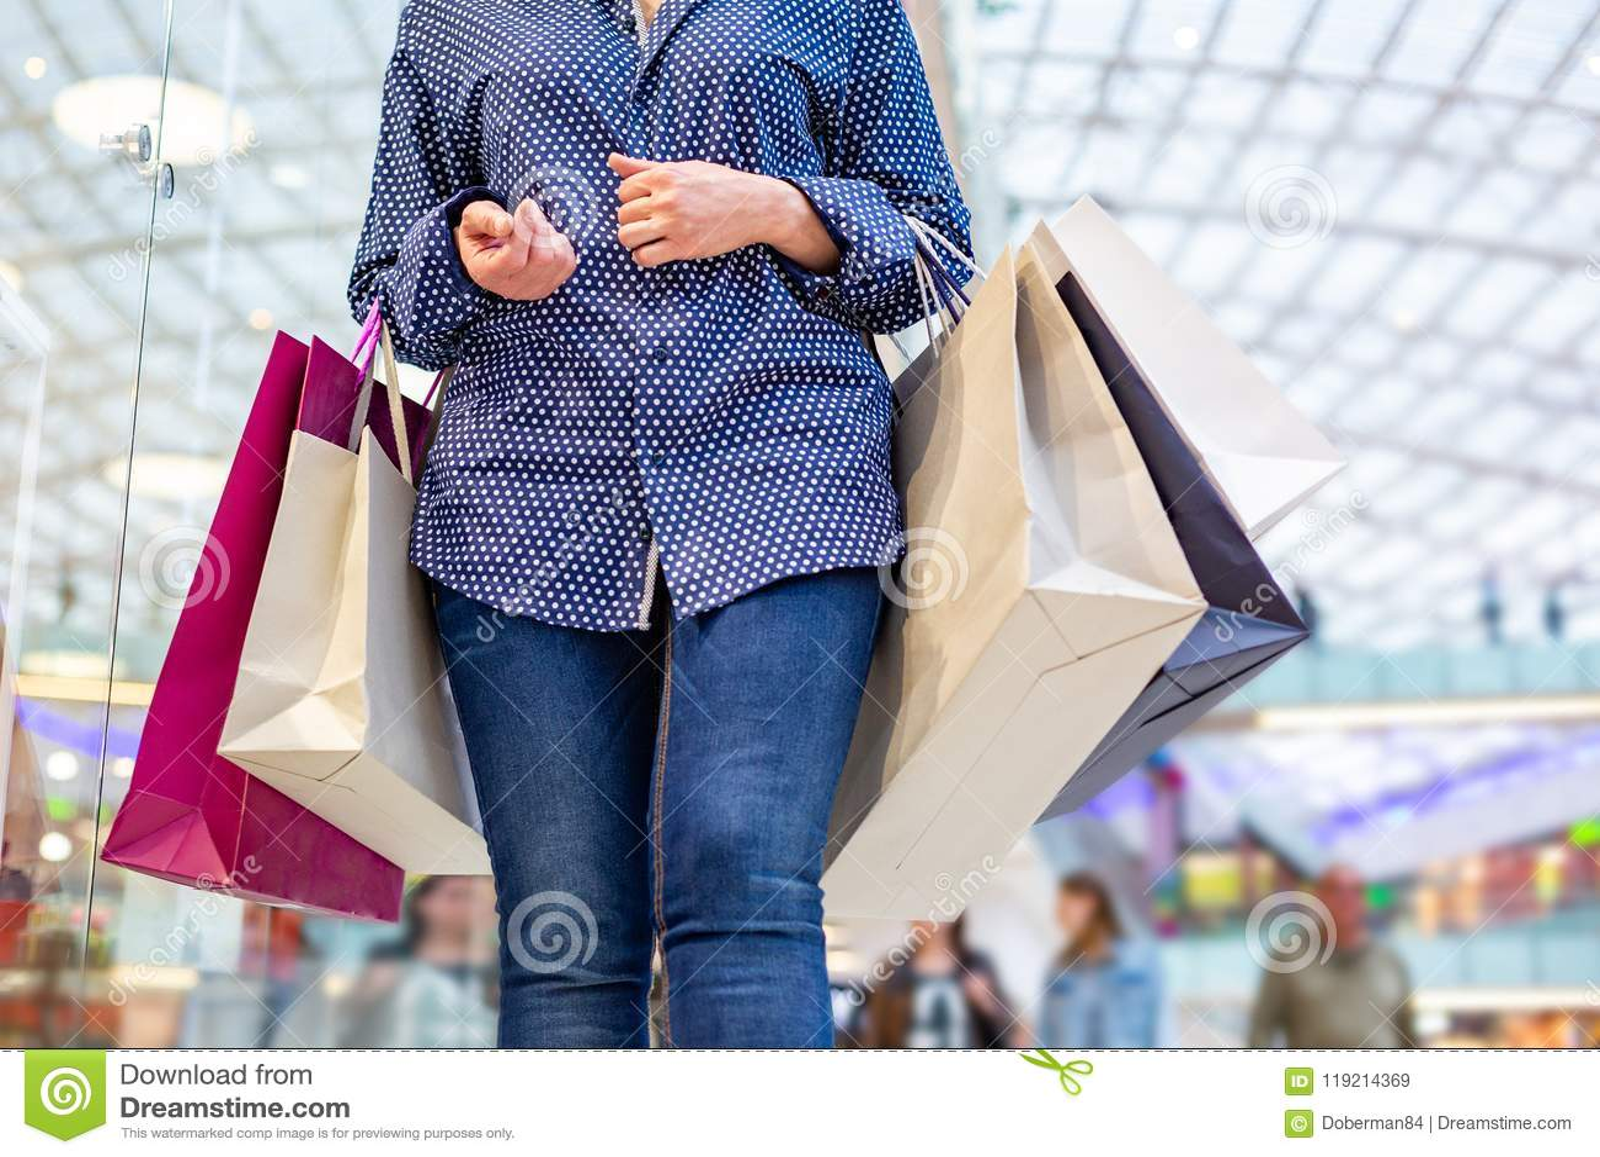 Fashion Shopping Girl Portrait. Beauty Woman With Shopping